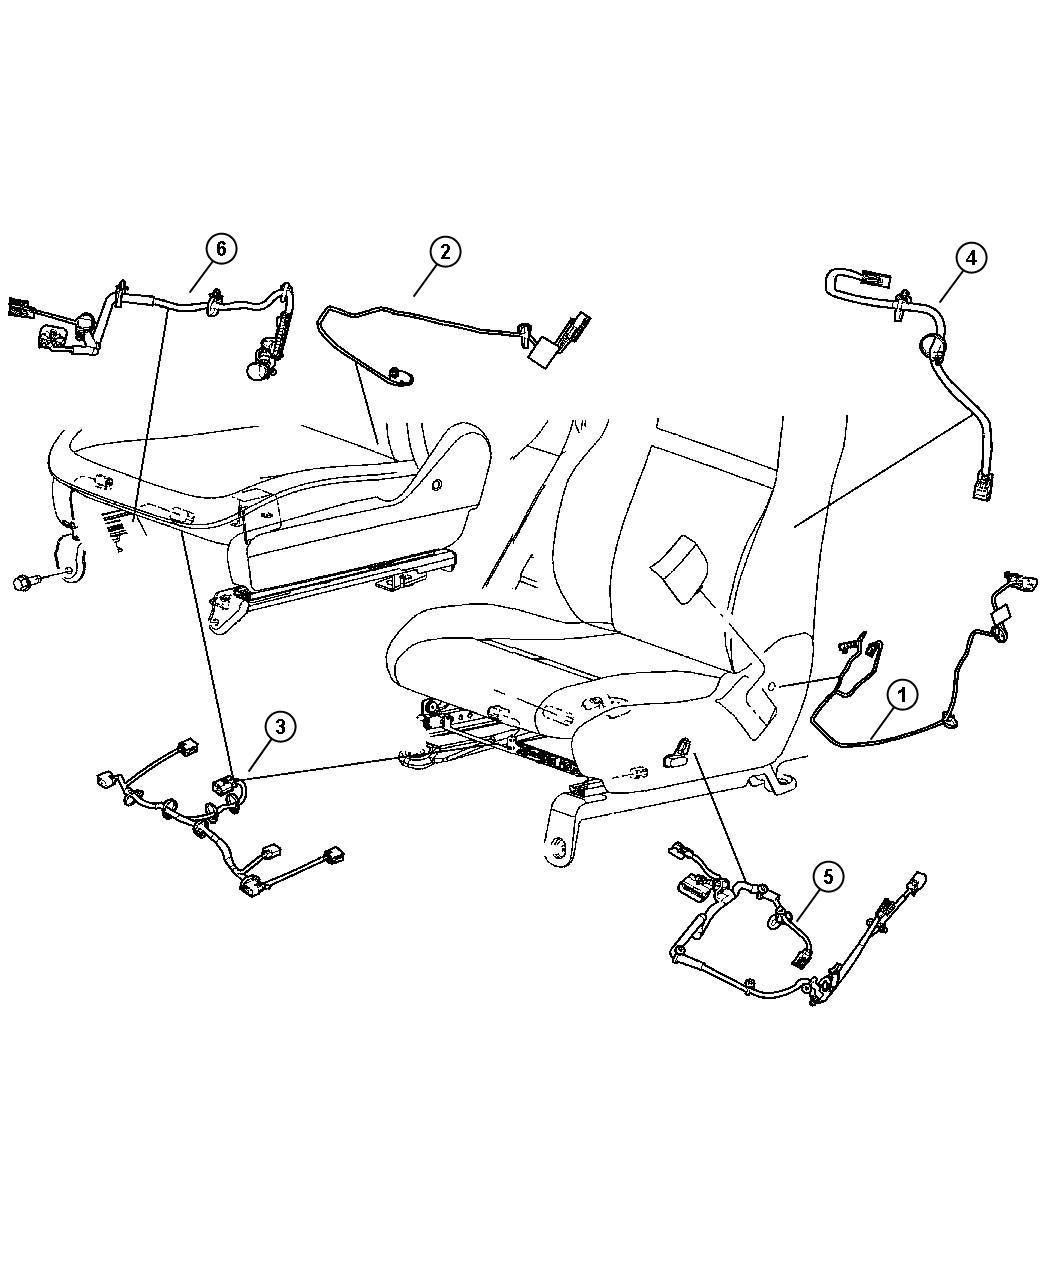 Jeep Grand Cherokee Wiring  Seat  Right  Manual  Power Track  Pretensioner  Trim   Cloth